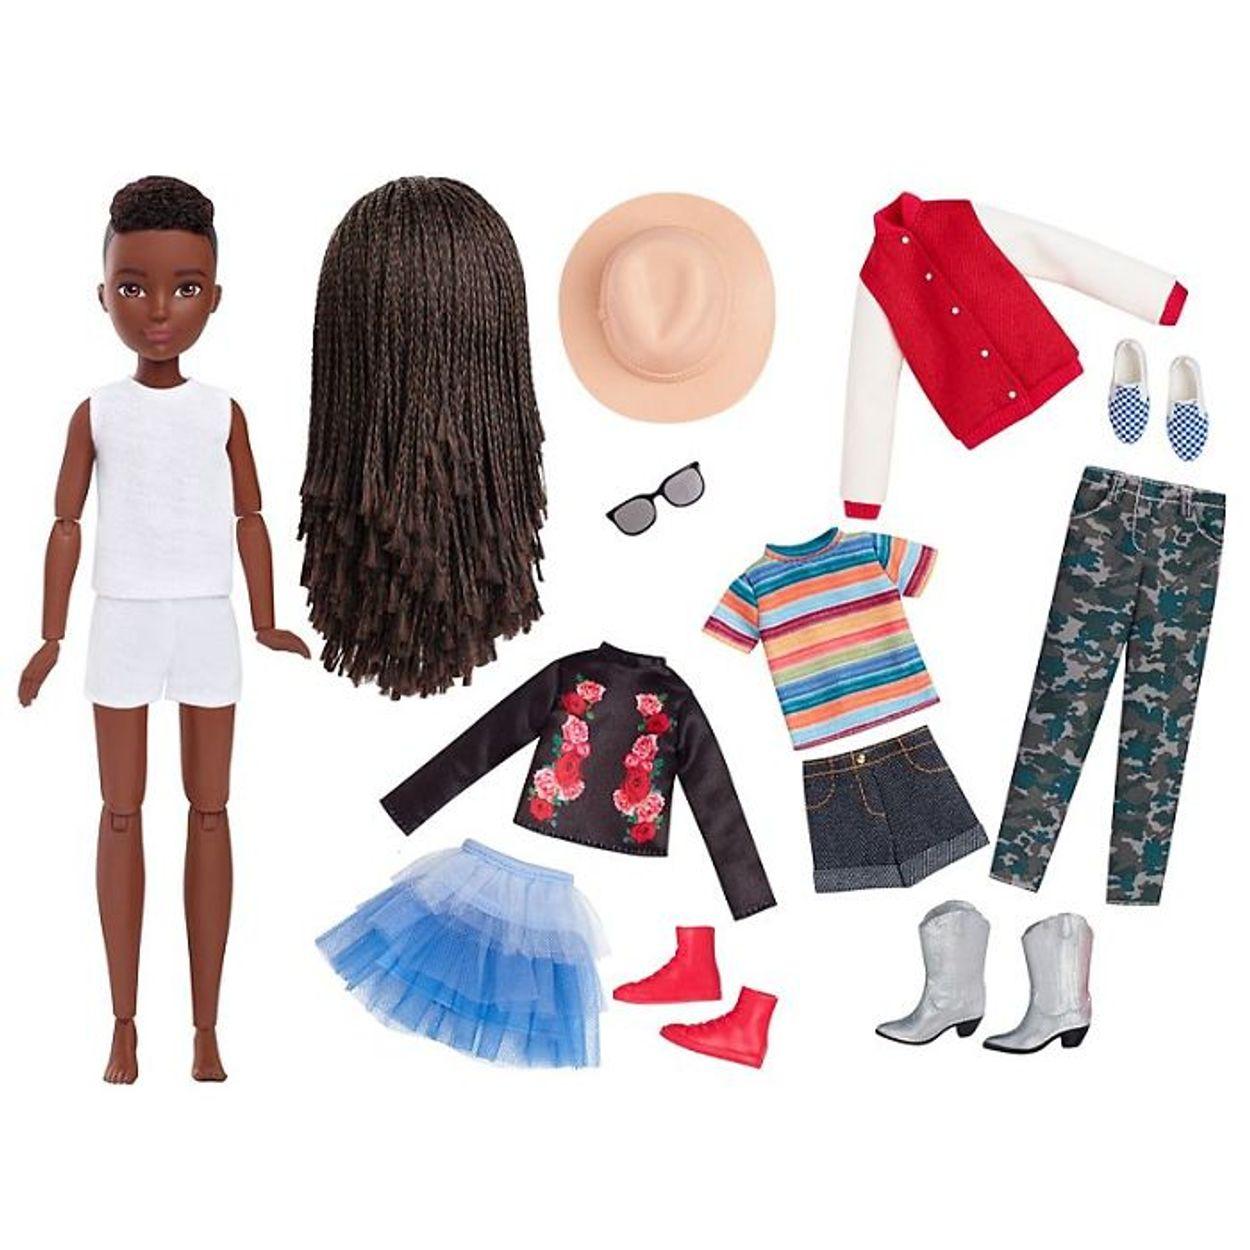 2A4 5d8c69be8f4b0-gender-neutral-dolls-toy-company-mattel-1-4-5d8b35012a7b5__700